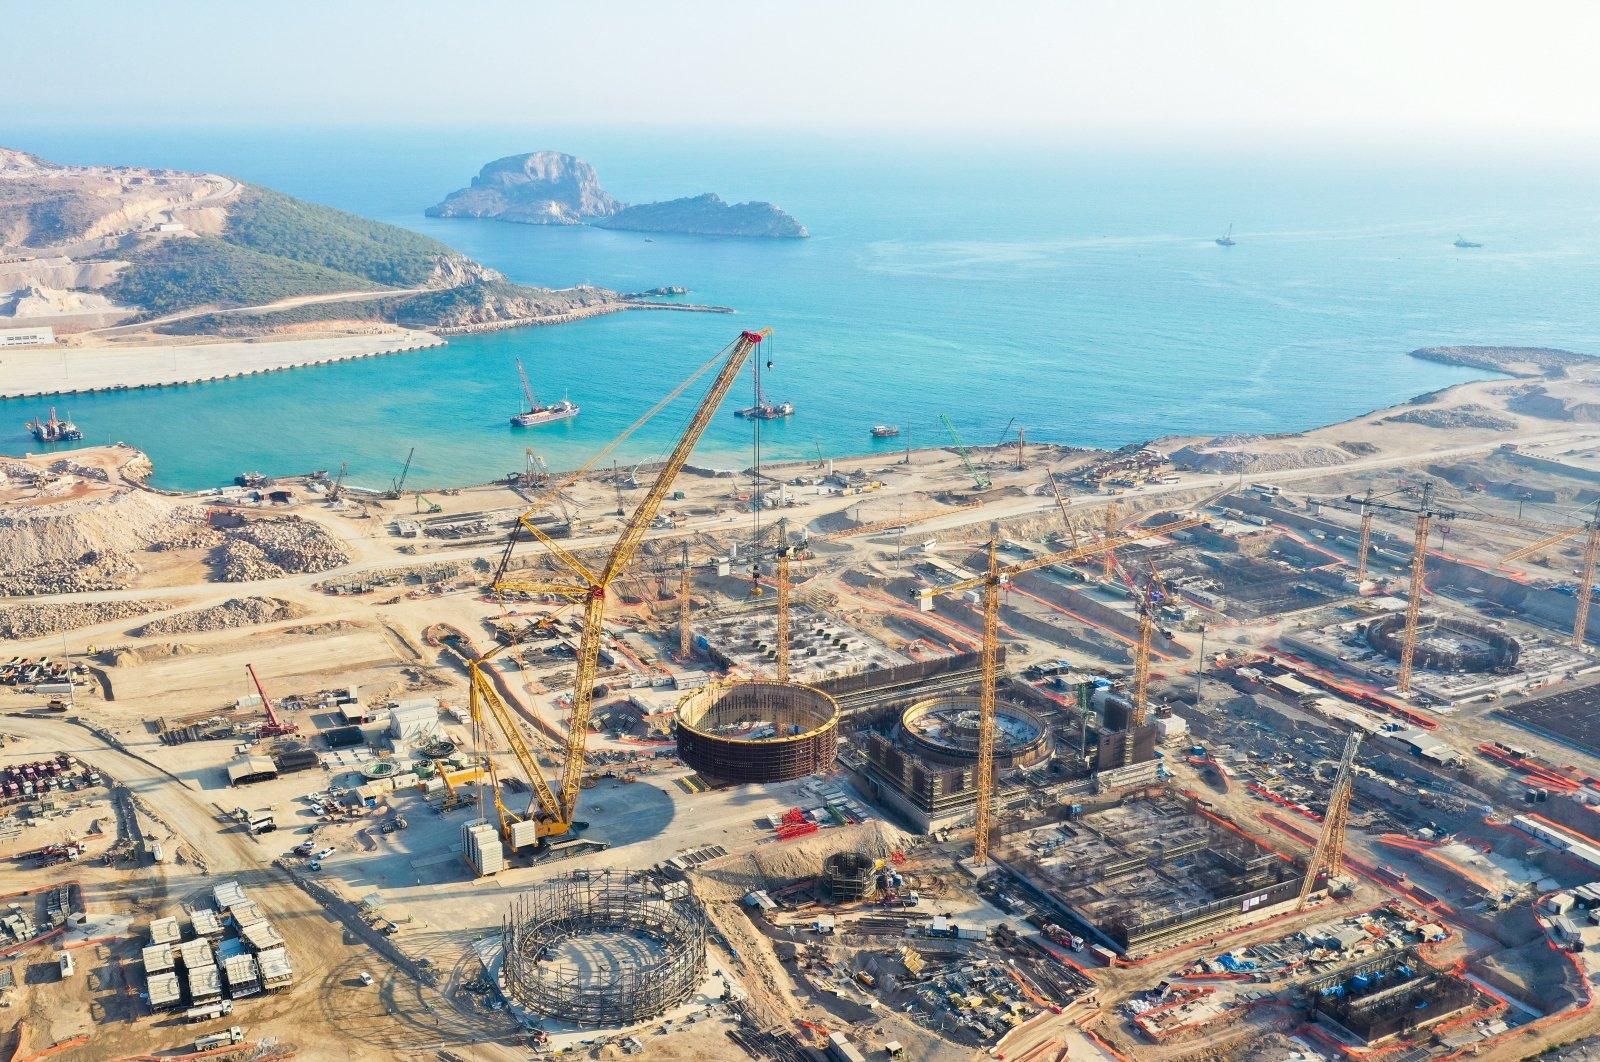 The construction site of the Akkuyu Nuclear Power Plantin southernMersin province, Turkey, Jan. 26, 2021. (IHA Photo)